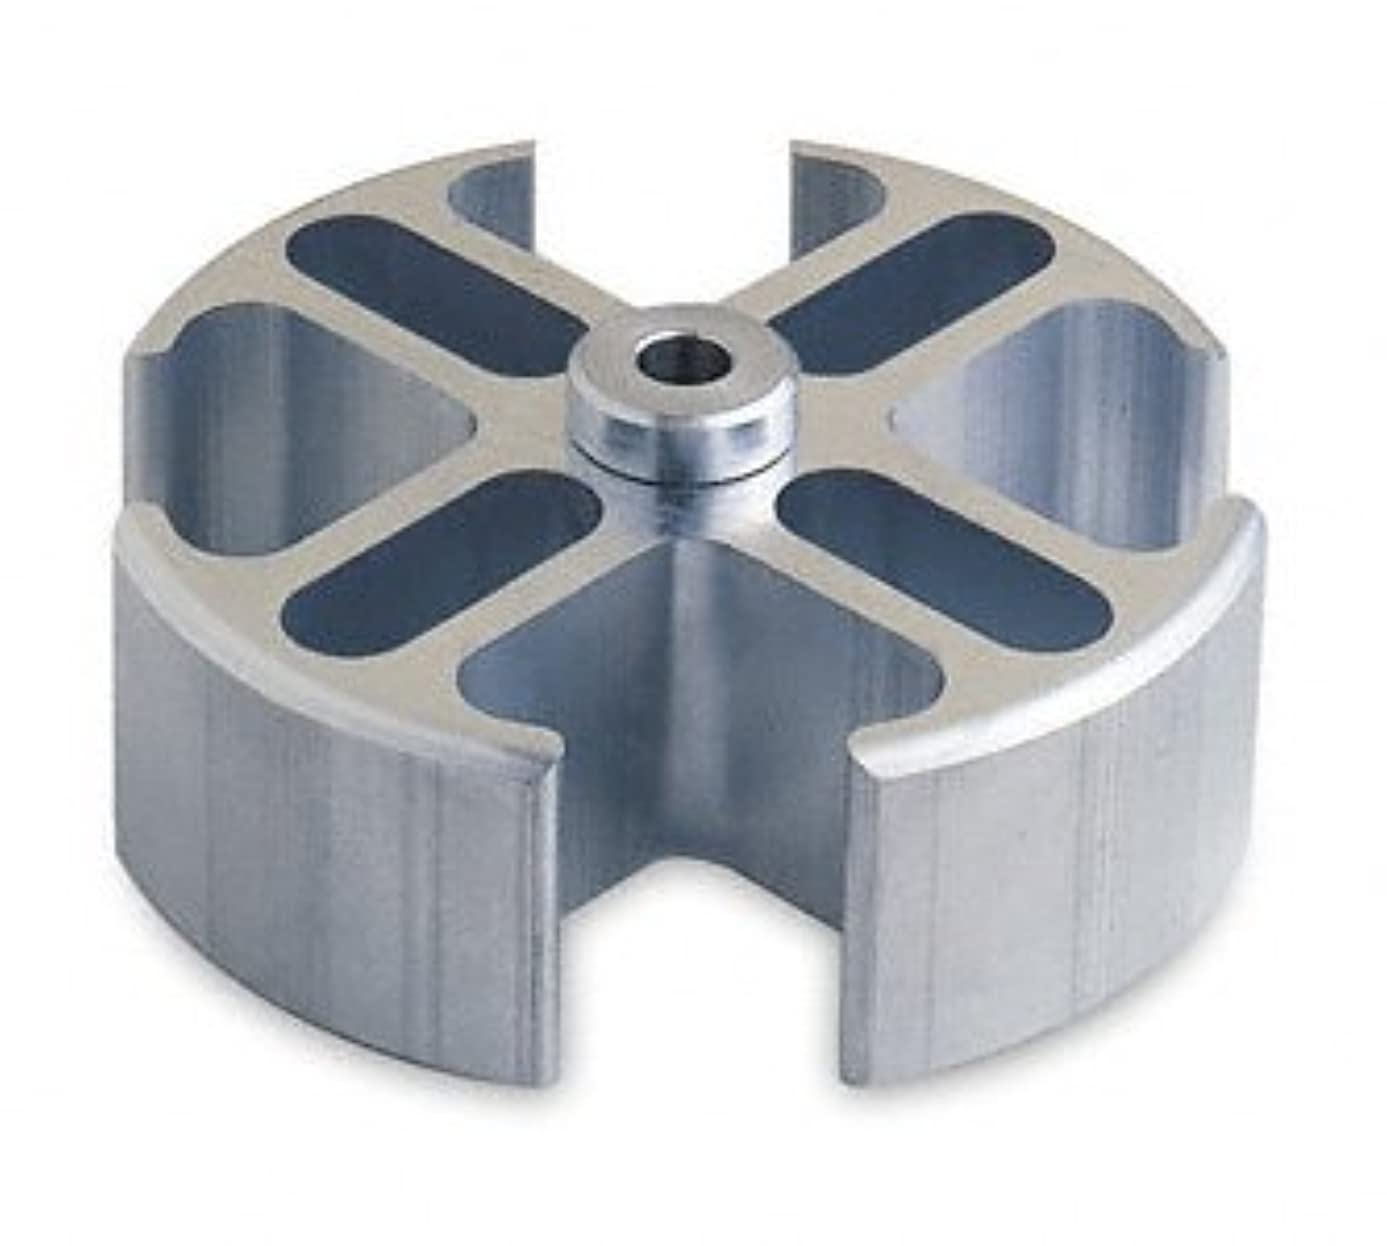 Flex-a-lite 504 Aluminum 1/2